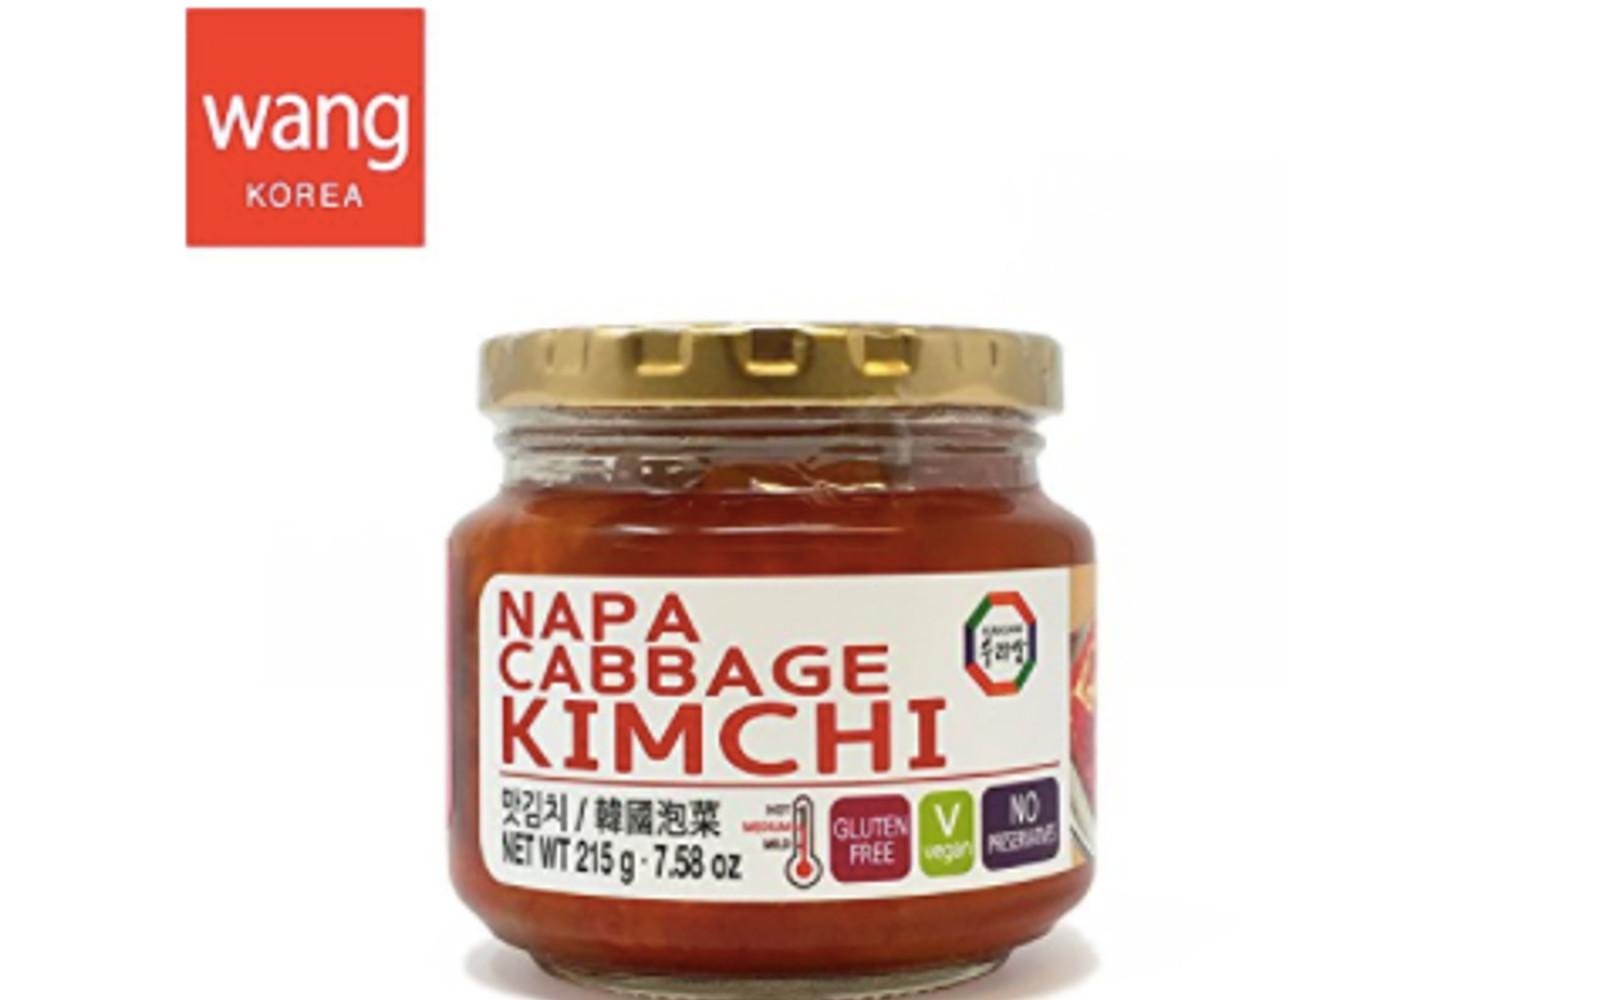 Jarred Vegan Korean Kimchi